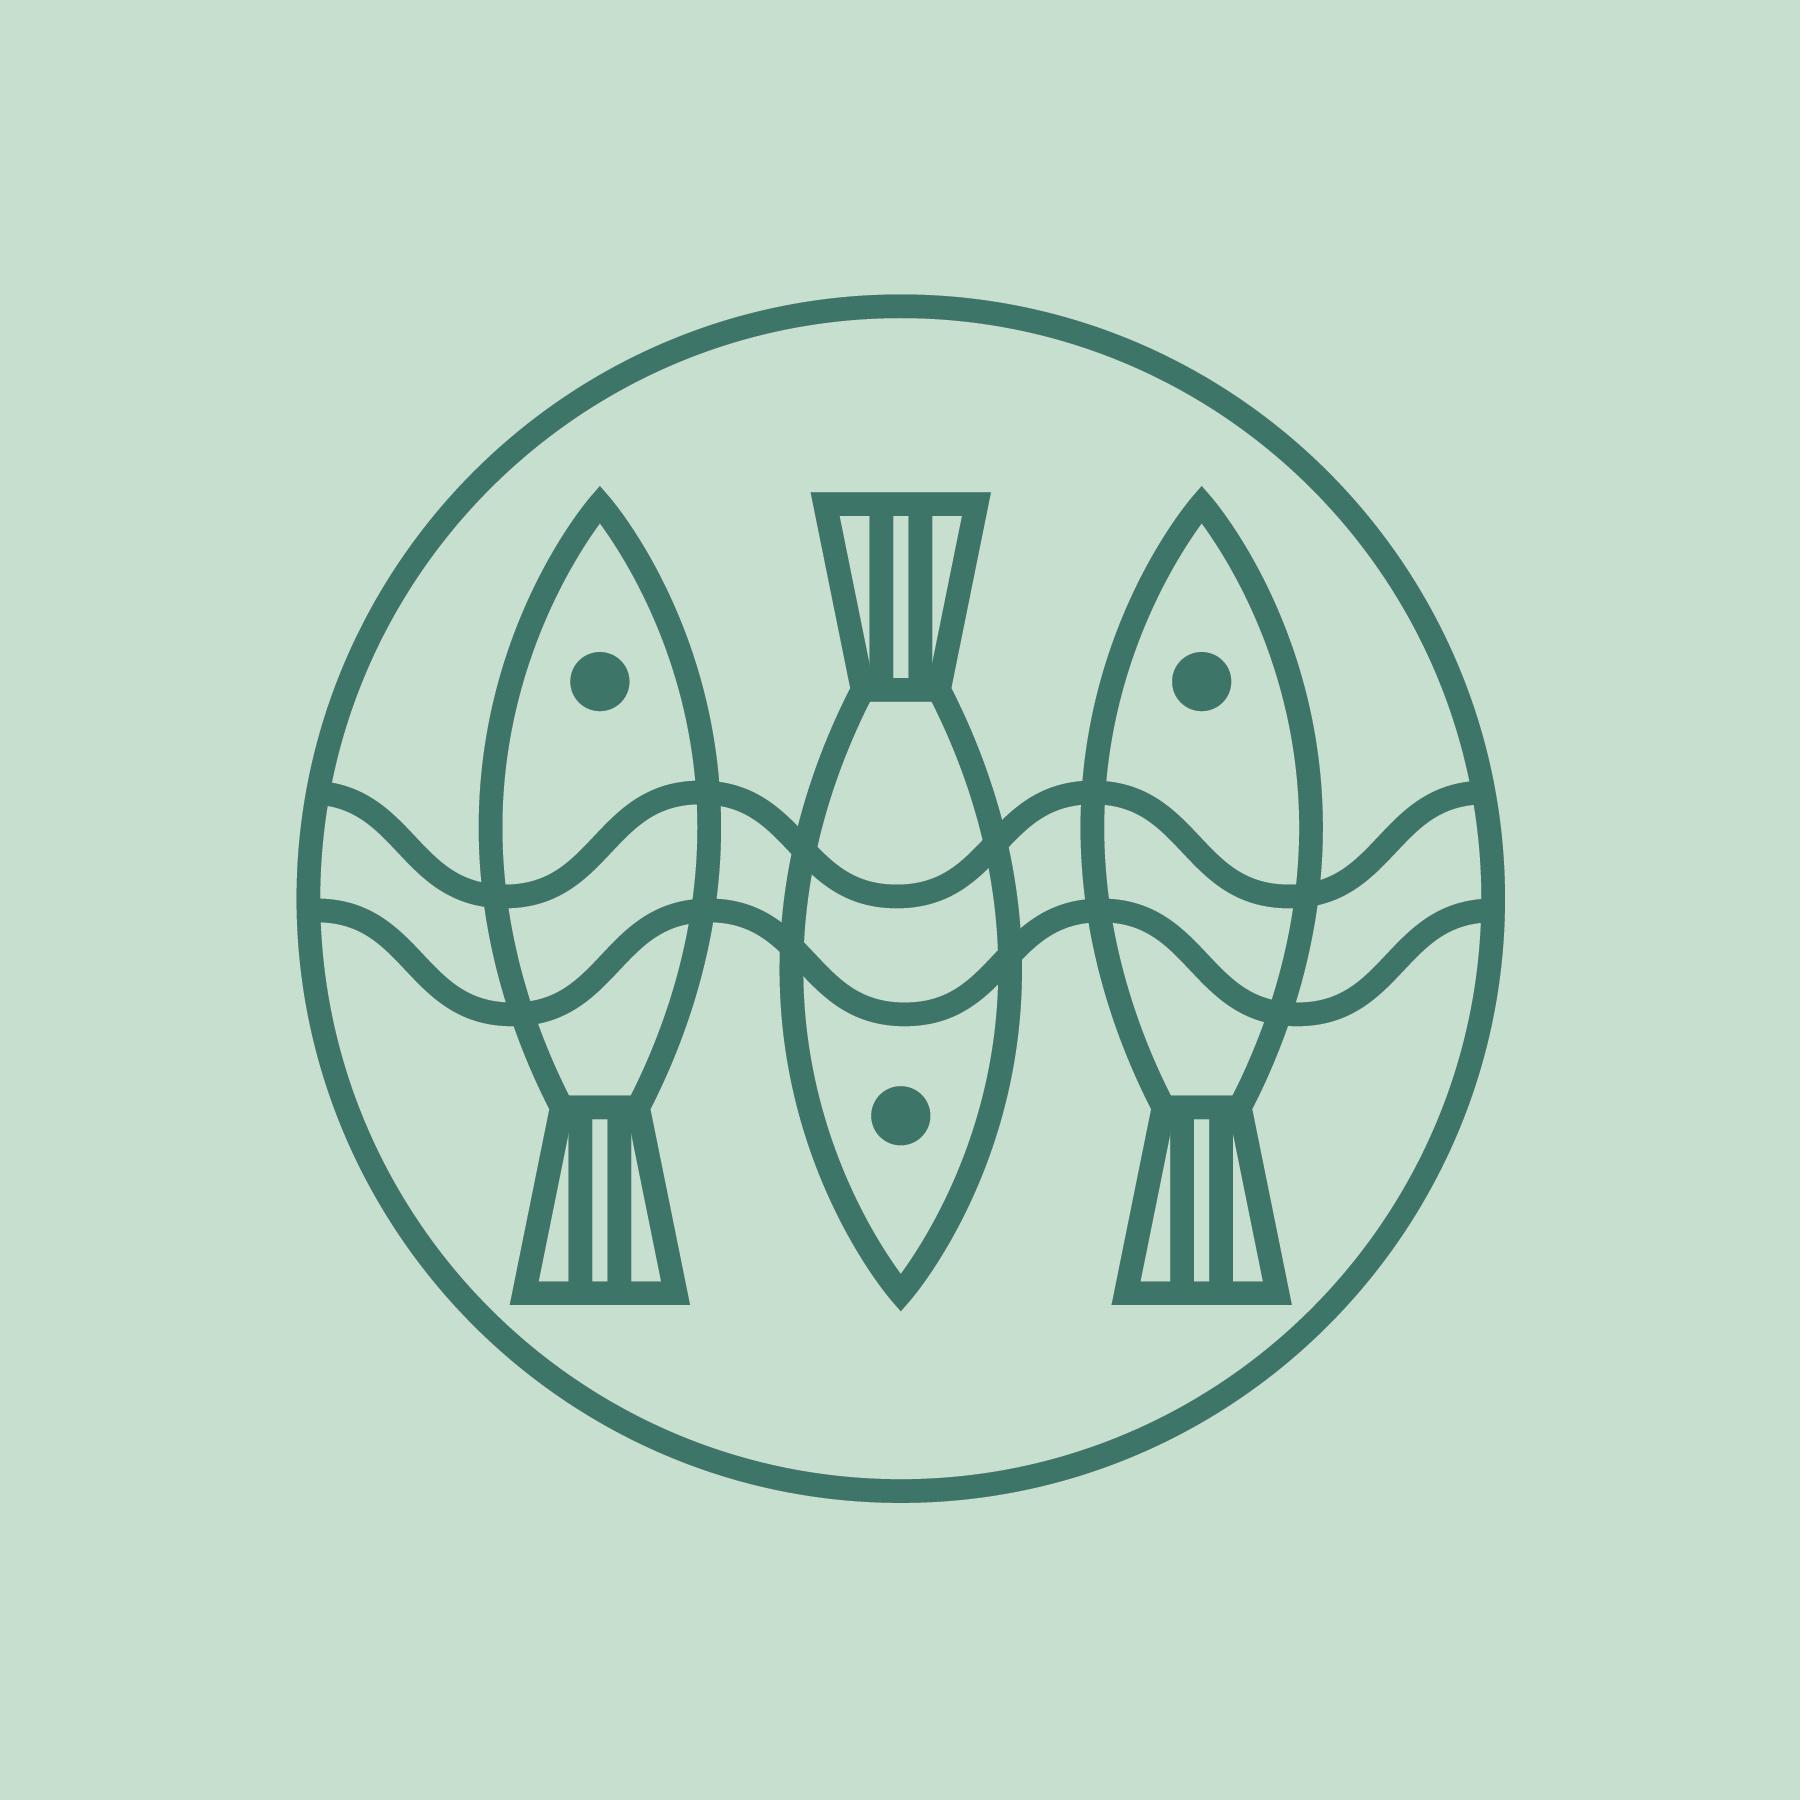 3fishlogo_icon_web_mint.jpg